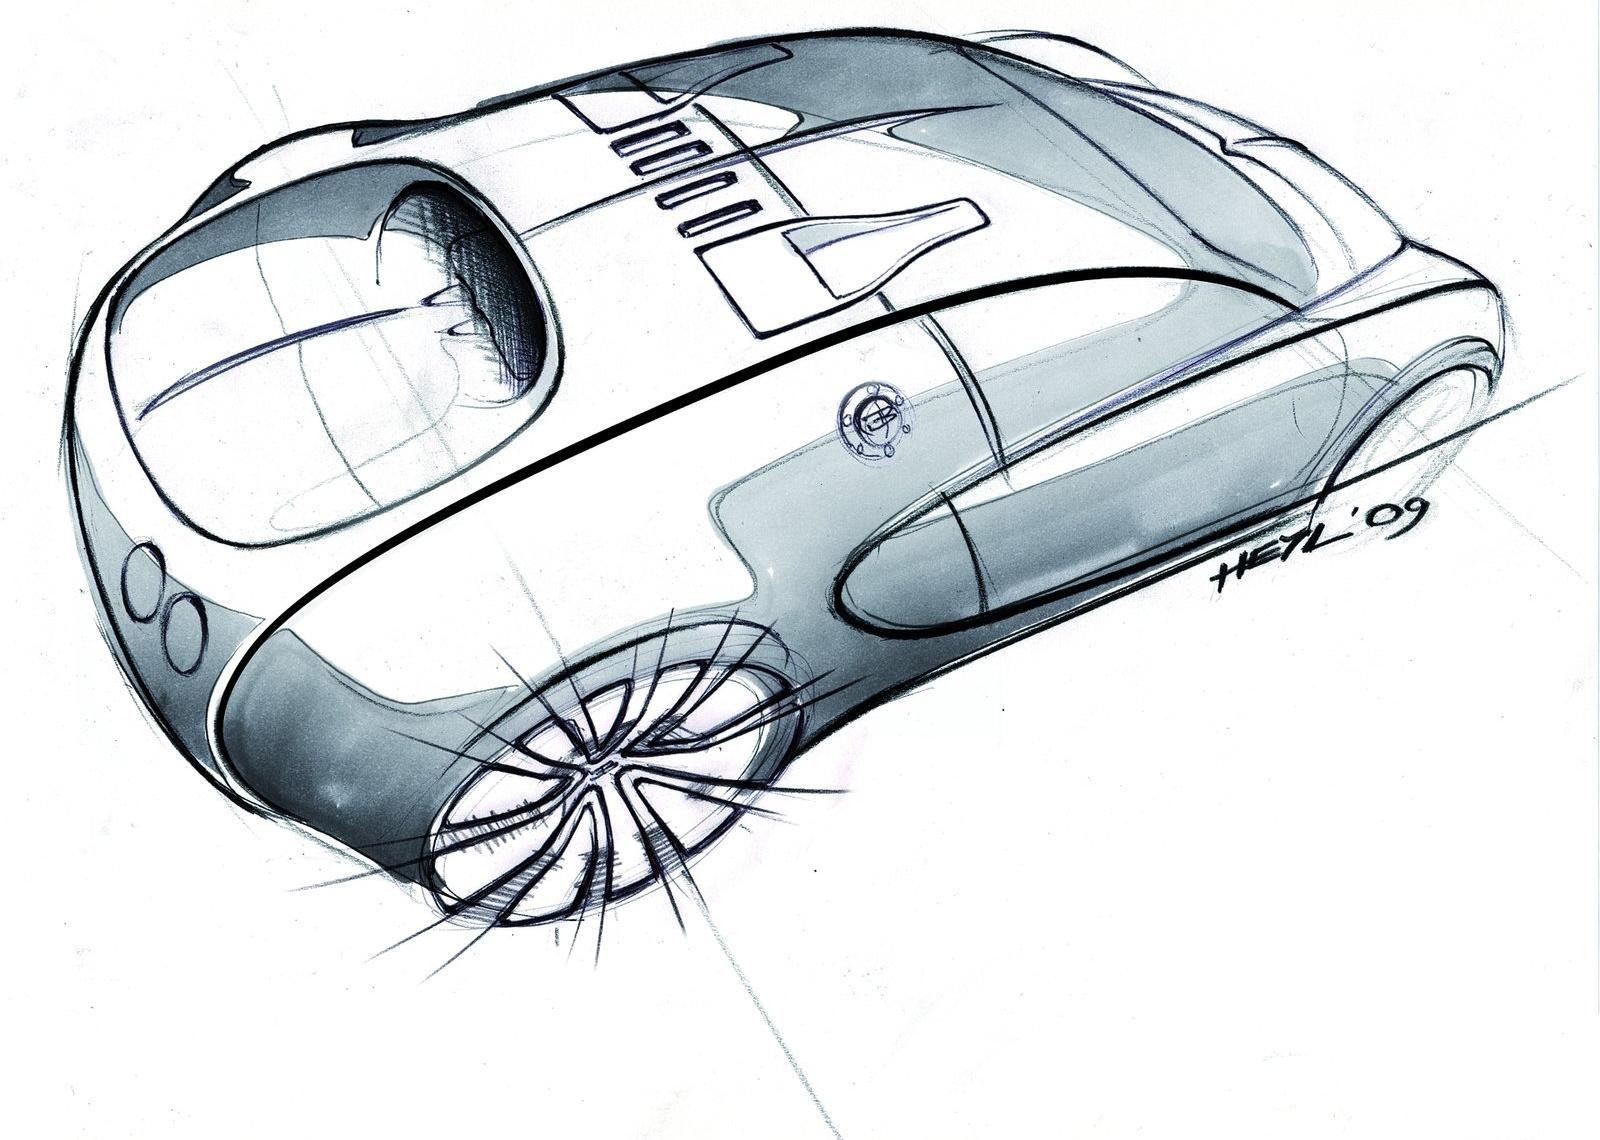 Bugatti Veyron automotive industrial design sketch | Design ...